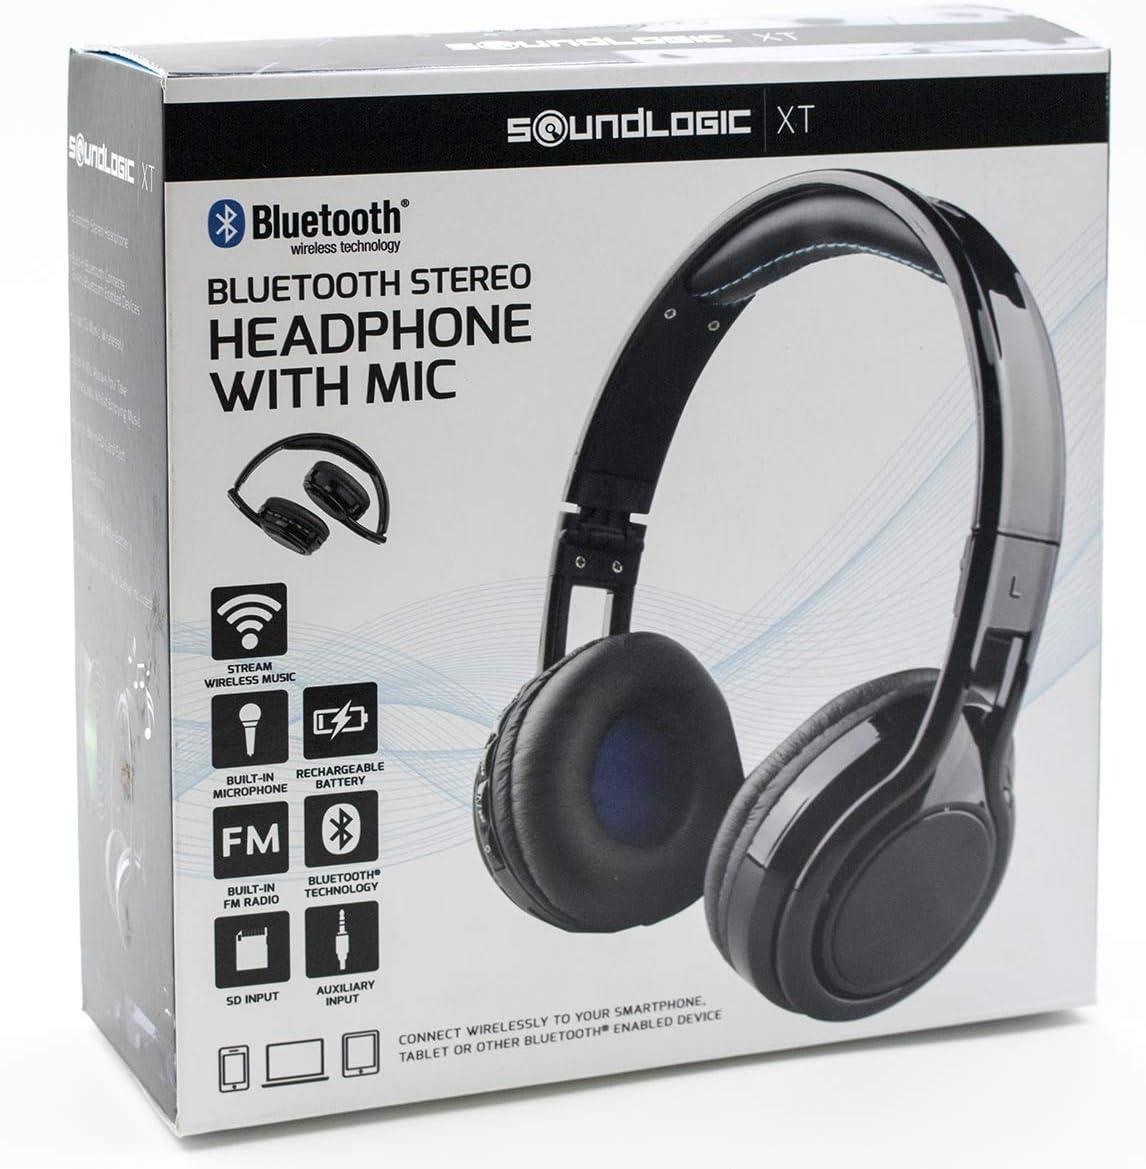 Amerisound Bluetooth Wireless Foldable Stereo Headphone W/Mic,FM,SD card